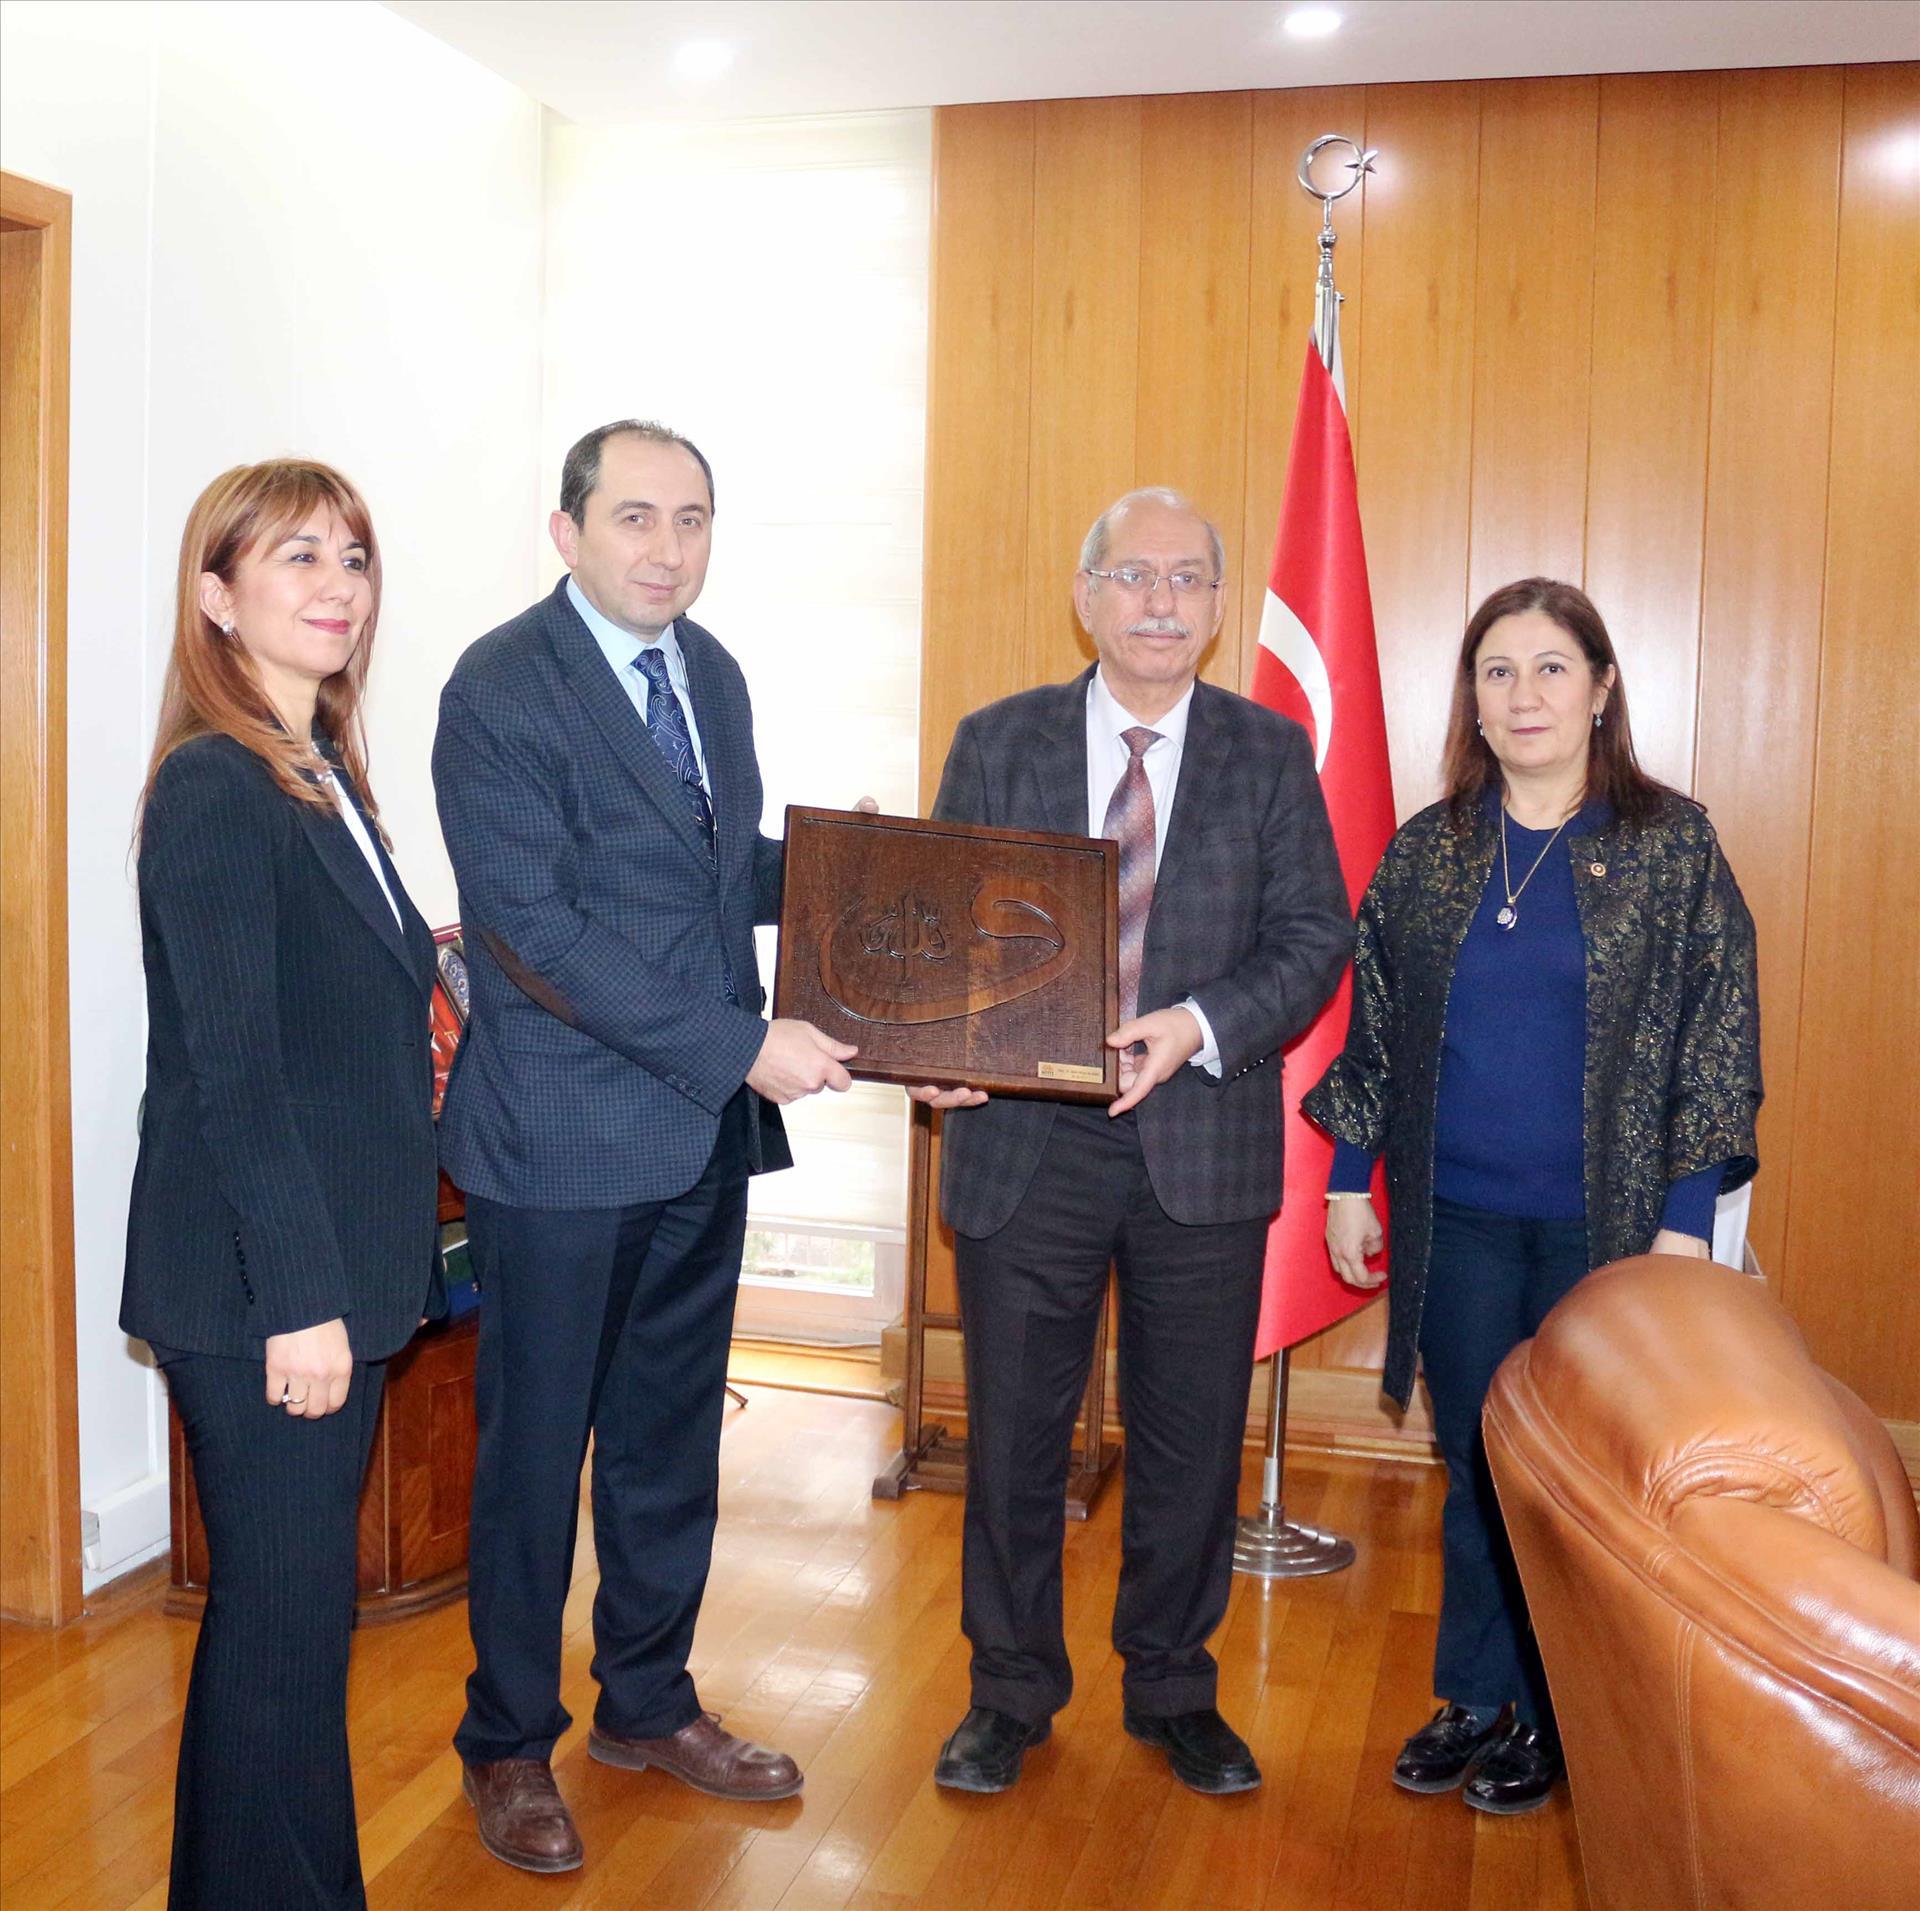 Türk Tarih Kurumu Başkanı Prof. Dr. Turan'a Ziyaret